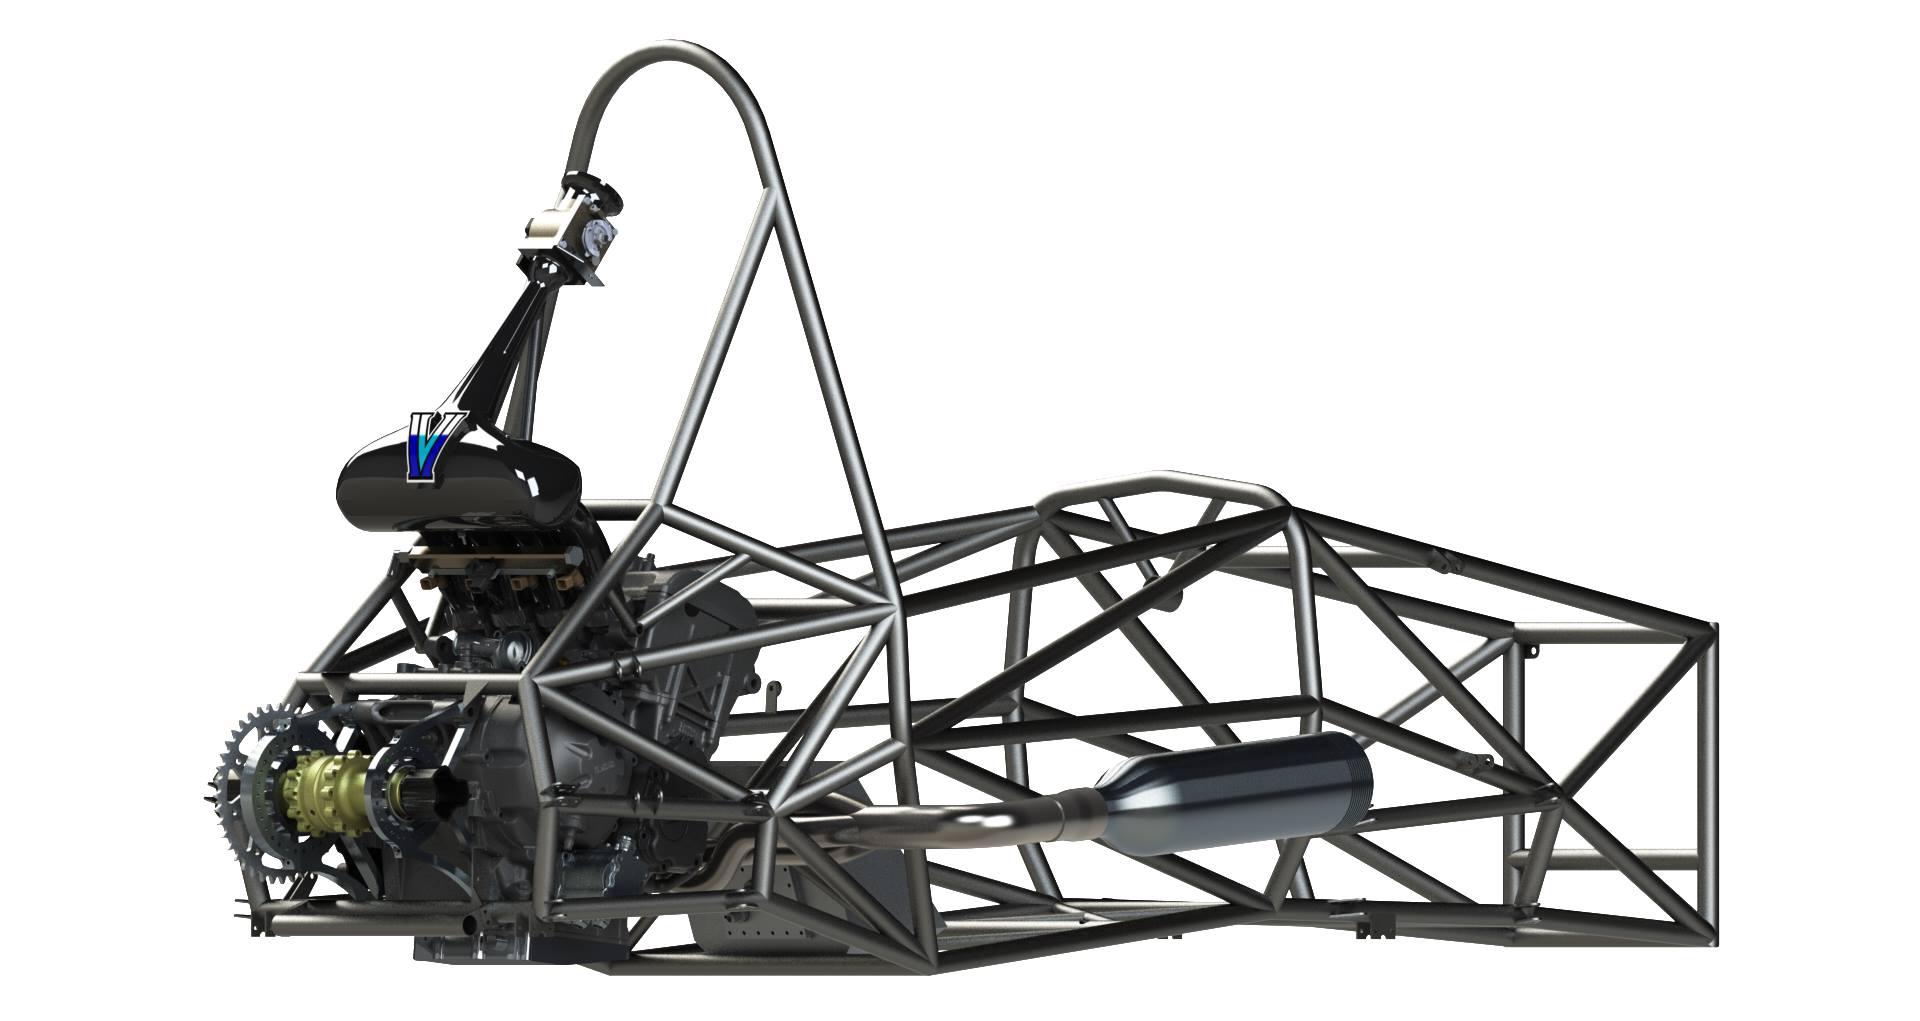 2008 Yamaha R6 – Bolton Works